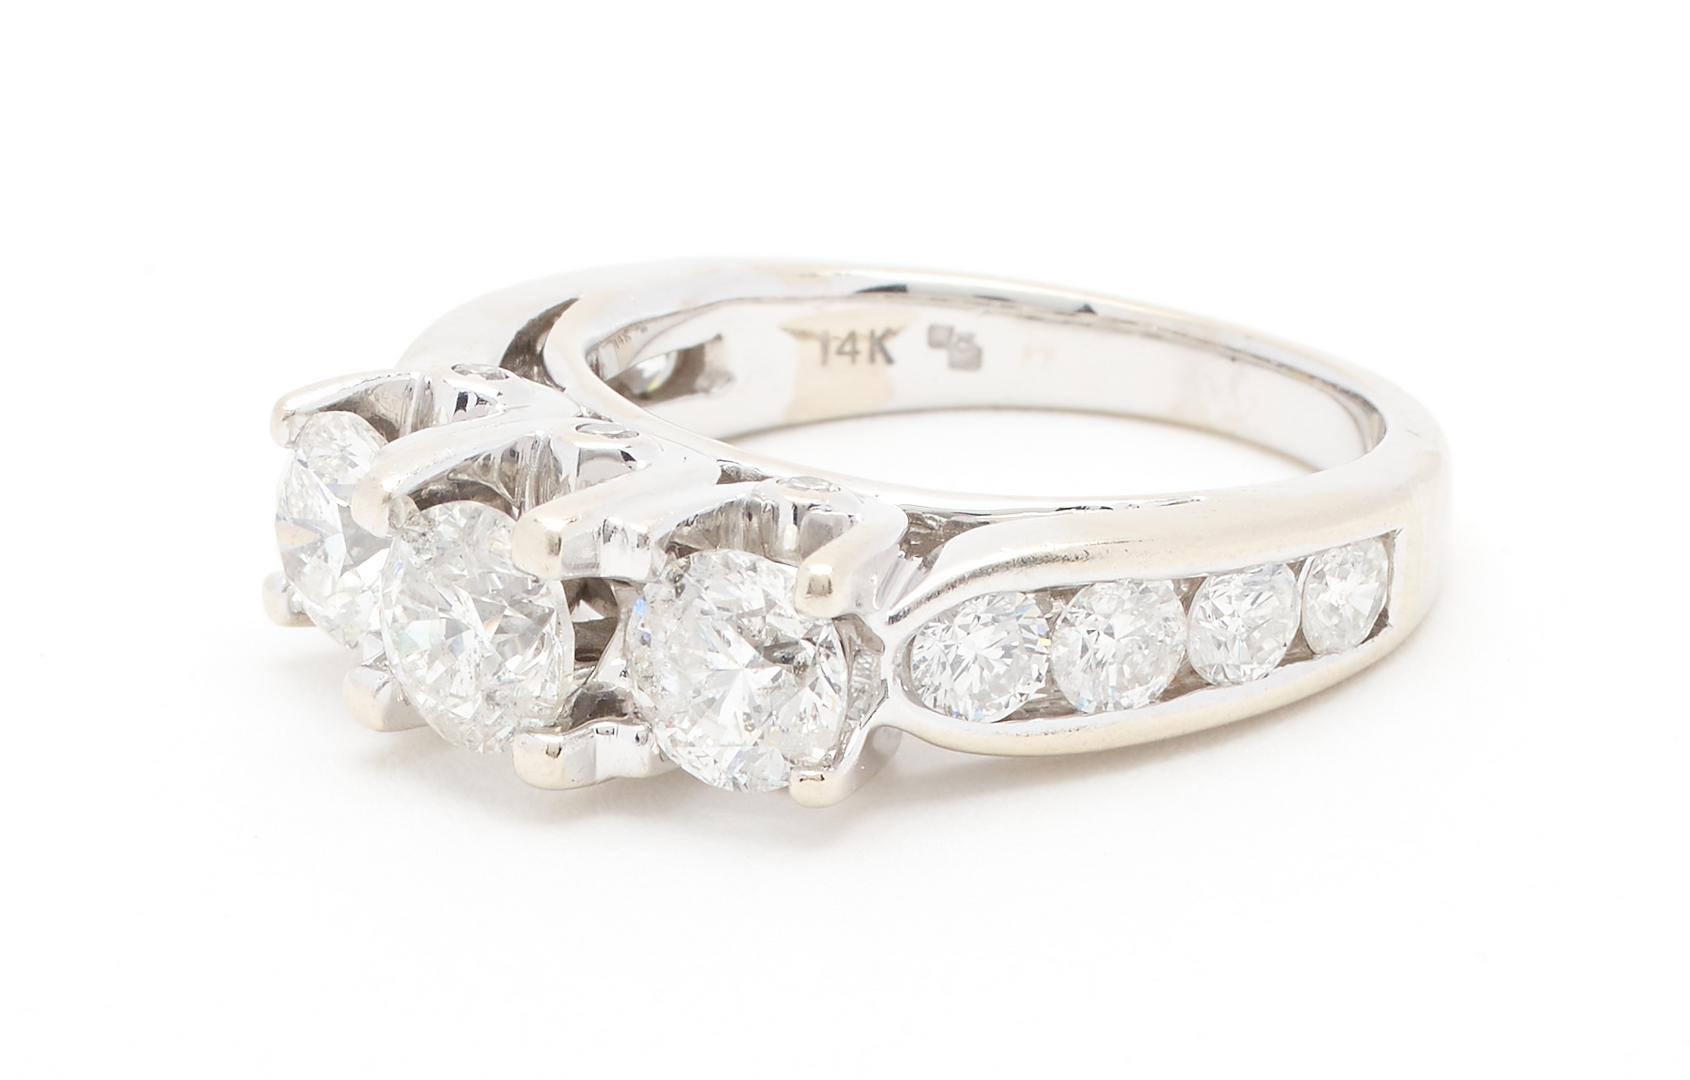 Lot 51: 14K White Gold 3 Diamond Ring